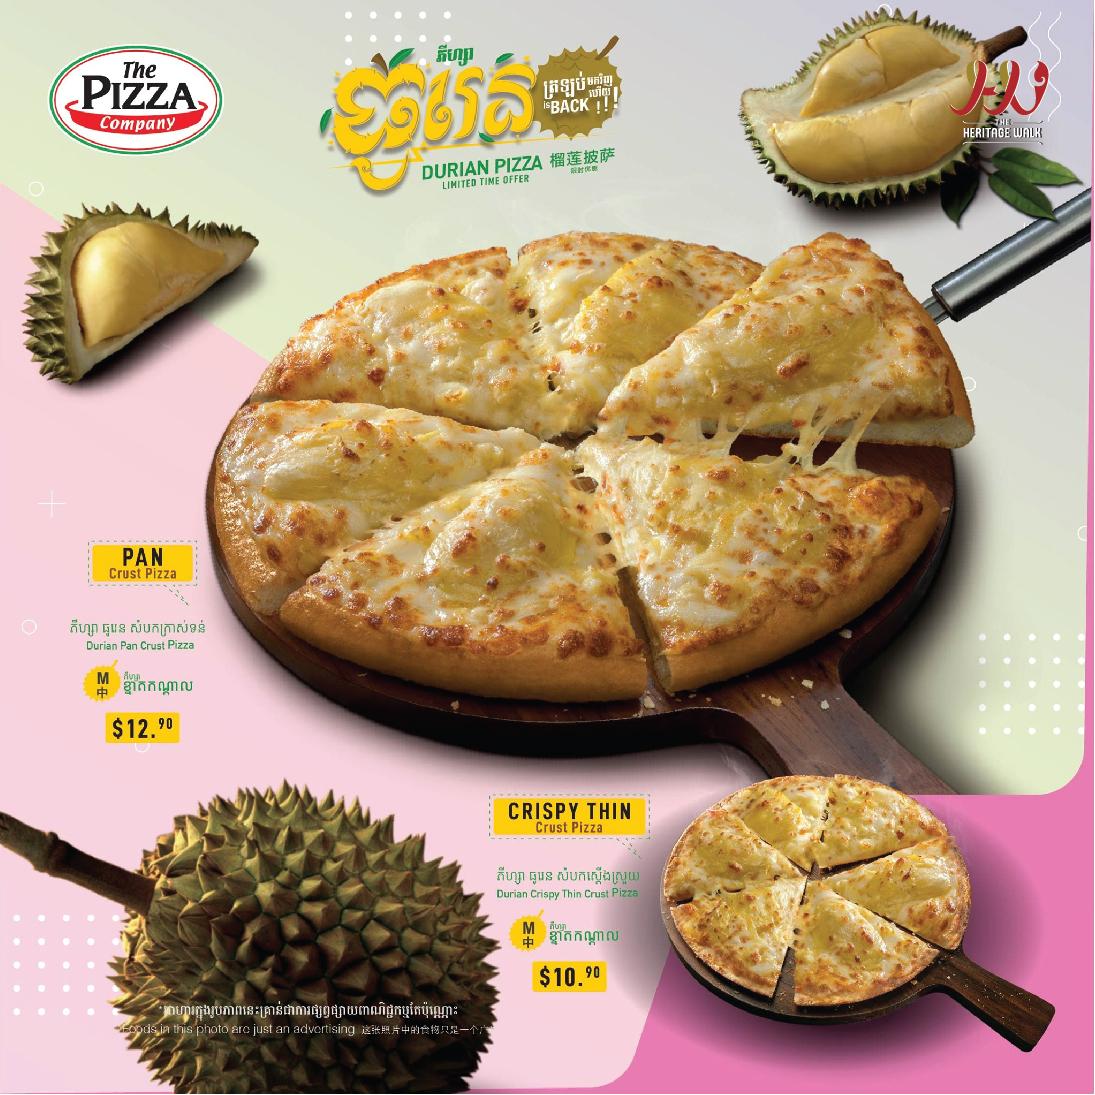 The Pizza Company – Durian Pizza